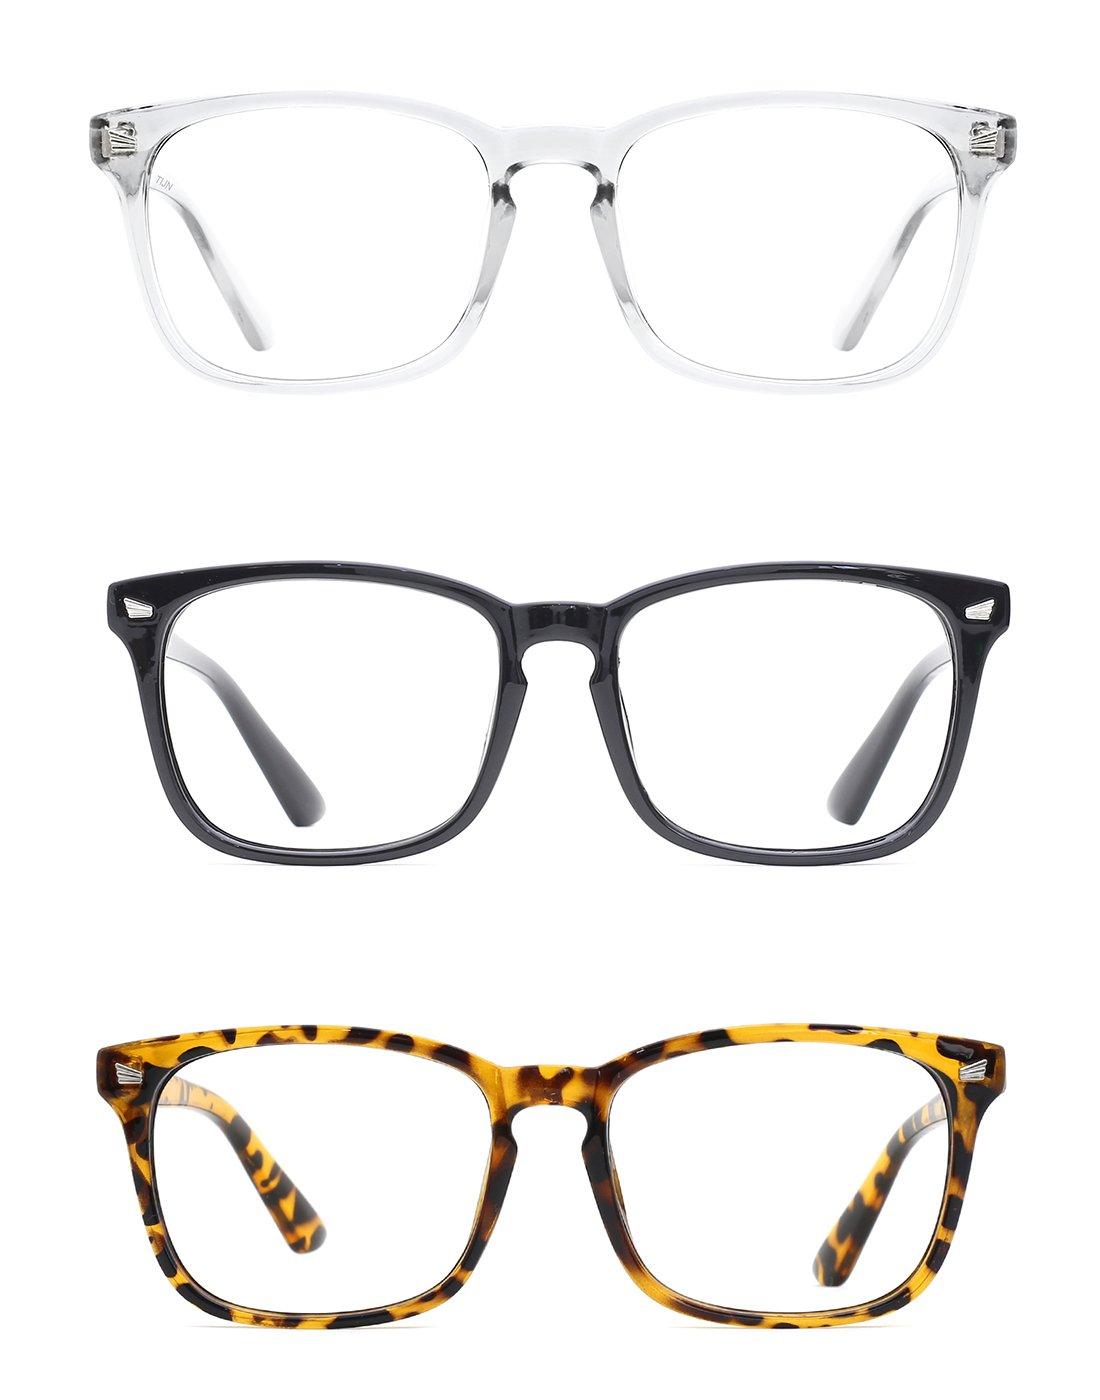 TIJN Unisex Non-Prescription Glasses Square Frame Clear Lens Eyeglasses 3-Pack (G, Transparent)